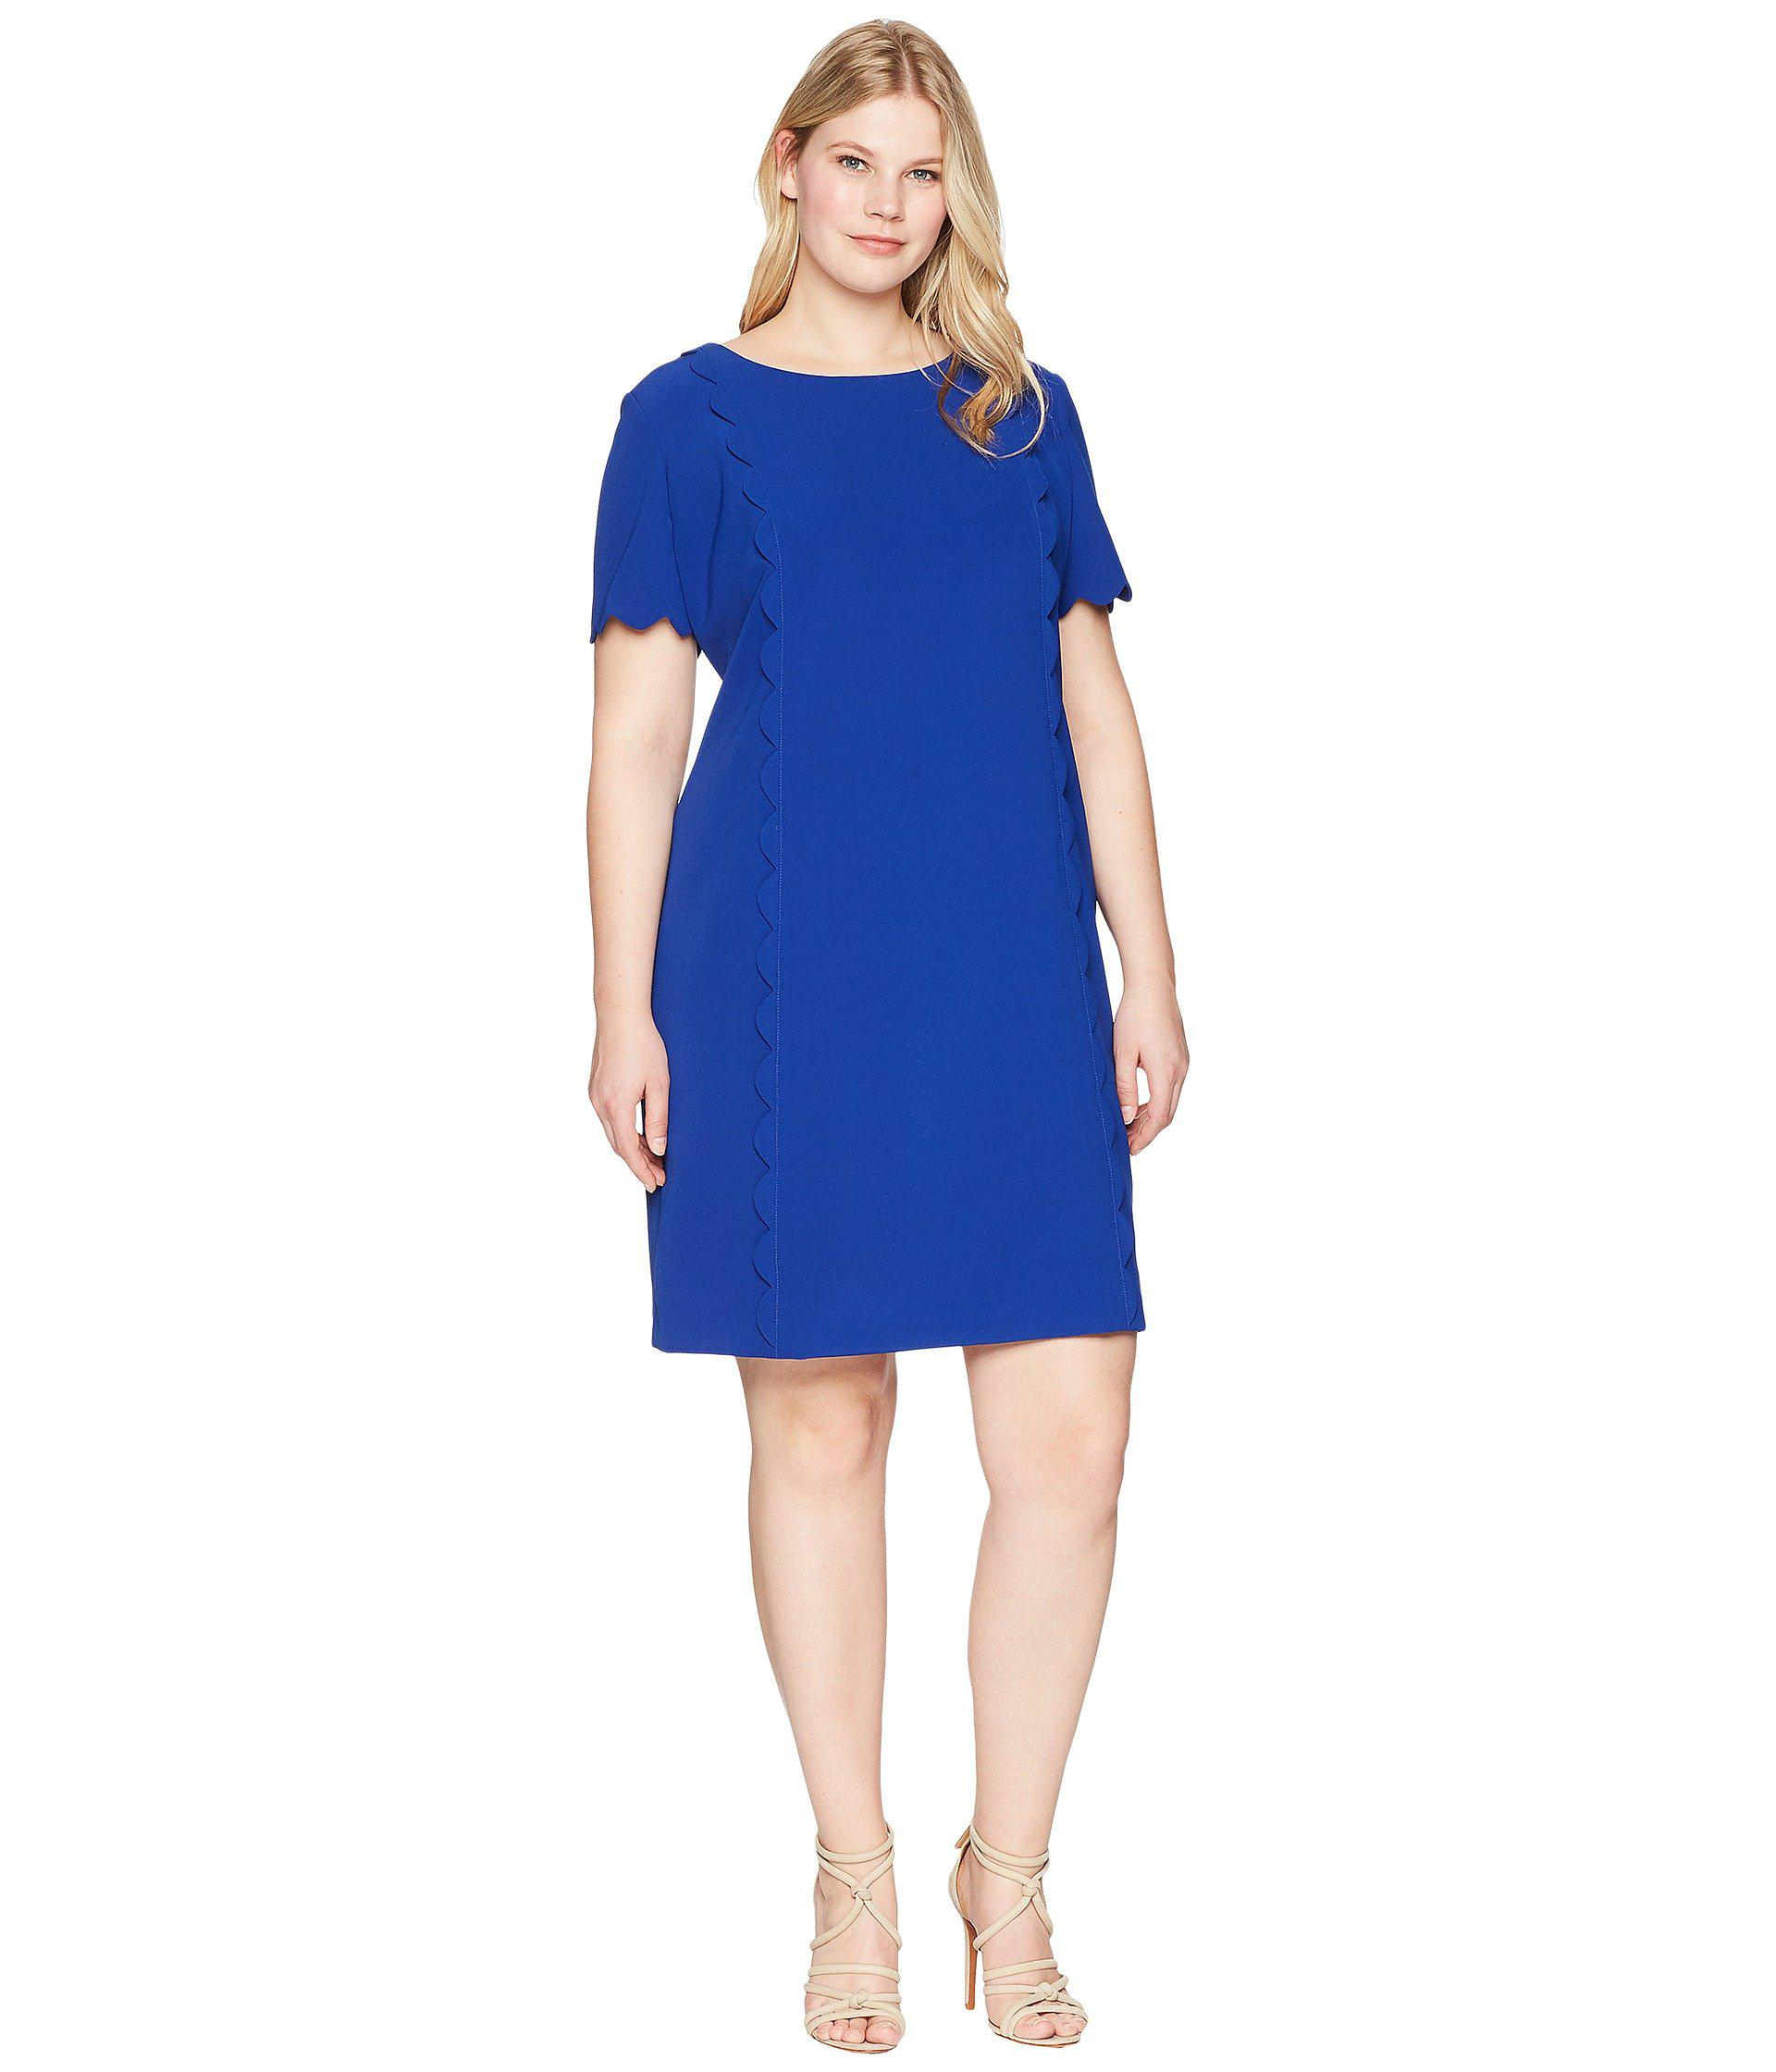 066298e15eda1 Tahari. Women's Blue Plus Size Scallop Trim Short Sleeve Shift Dress